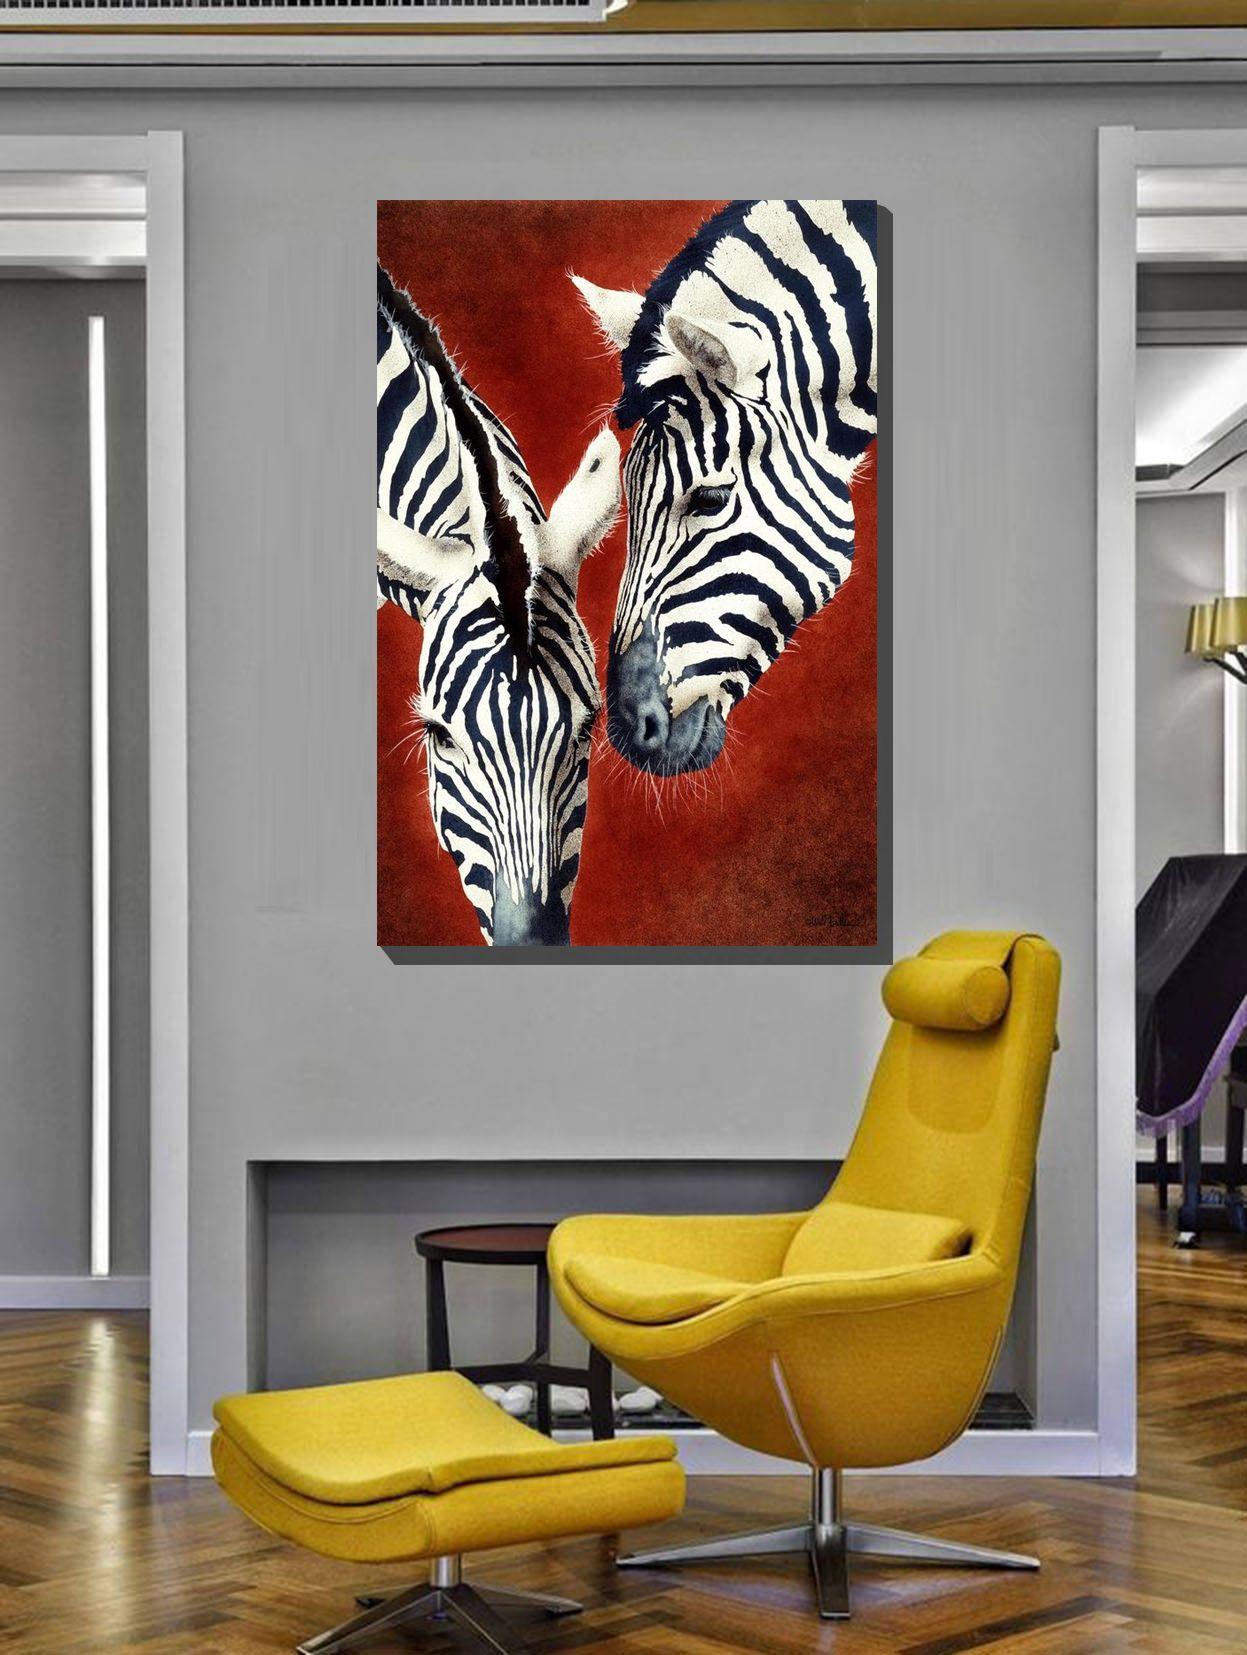 2019 的 Hd Printed Zebra Wall Decor Modern Art Picture ...